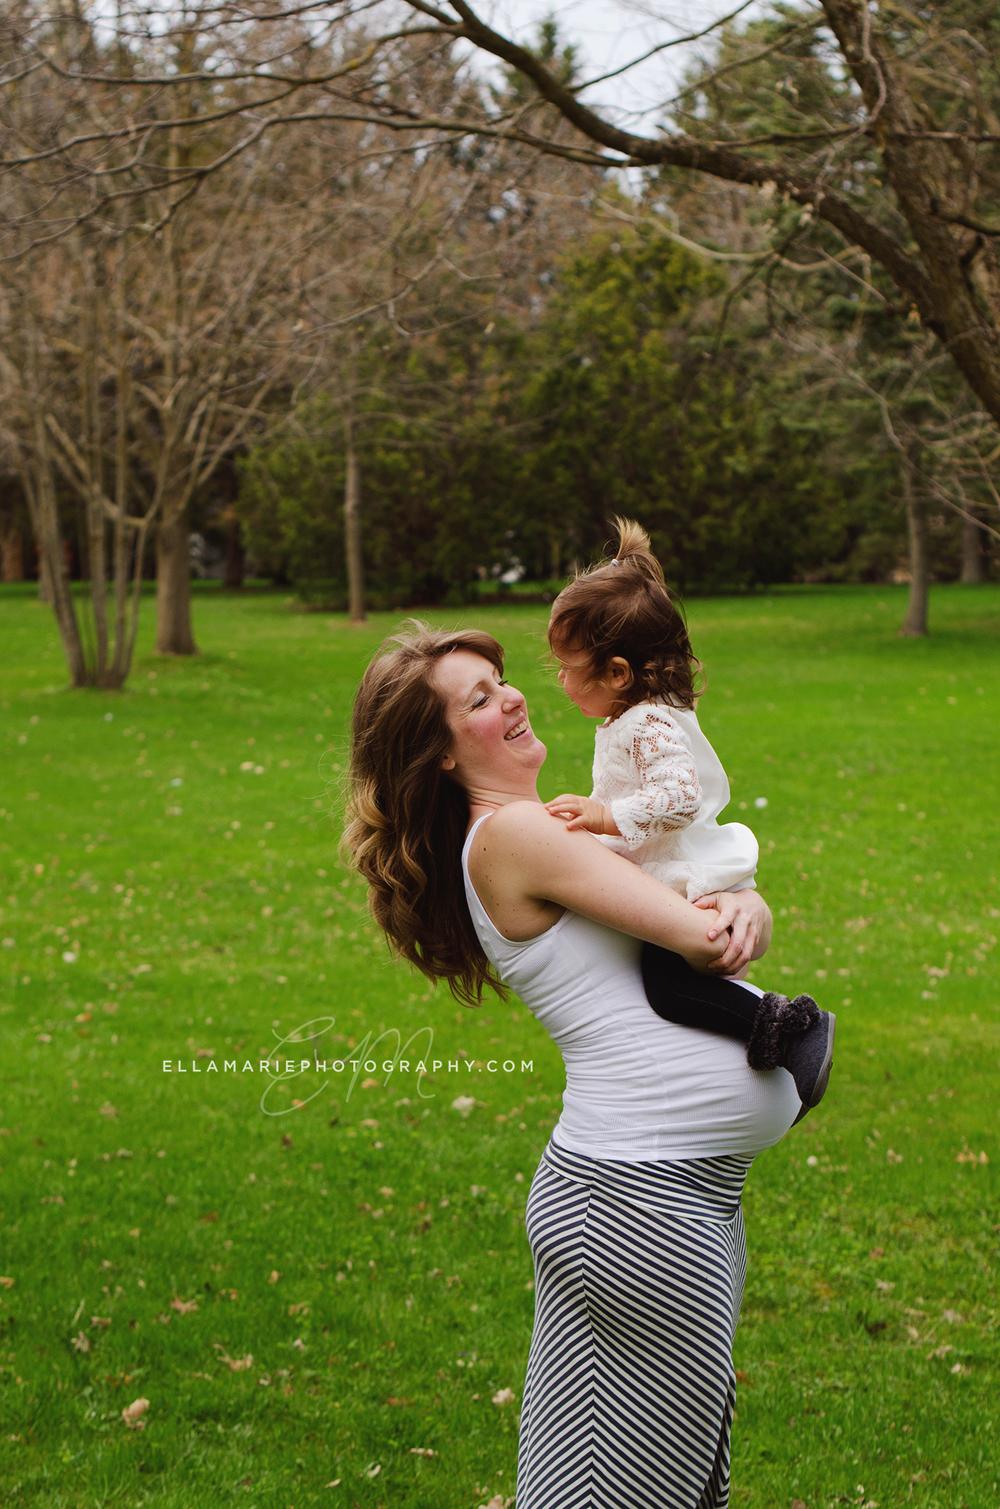 EllaMariePhotography_maternity_baby_infant_Baden_ON_New_Hamburg_Stratford_Waterloo_Kitchener_Guelph_Cambridge_Listowel_photographer_photography_36.jpg